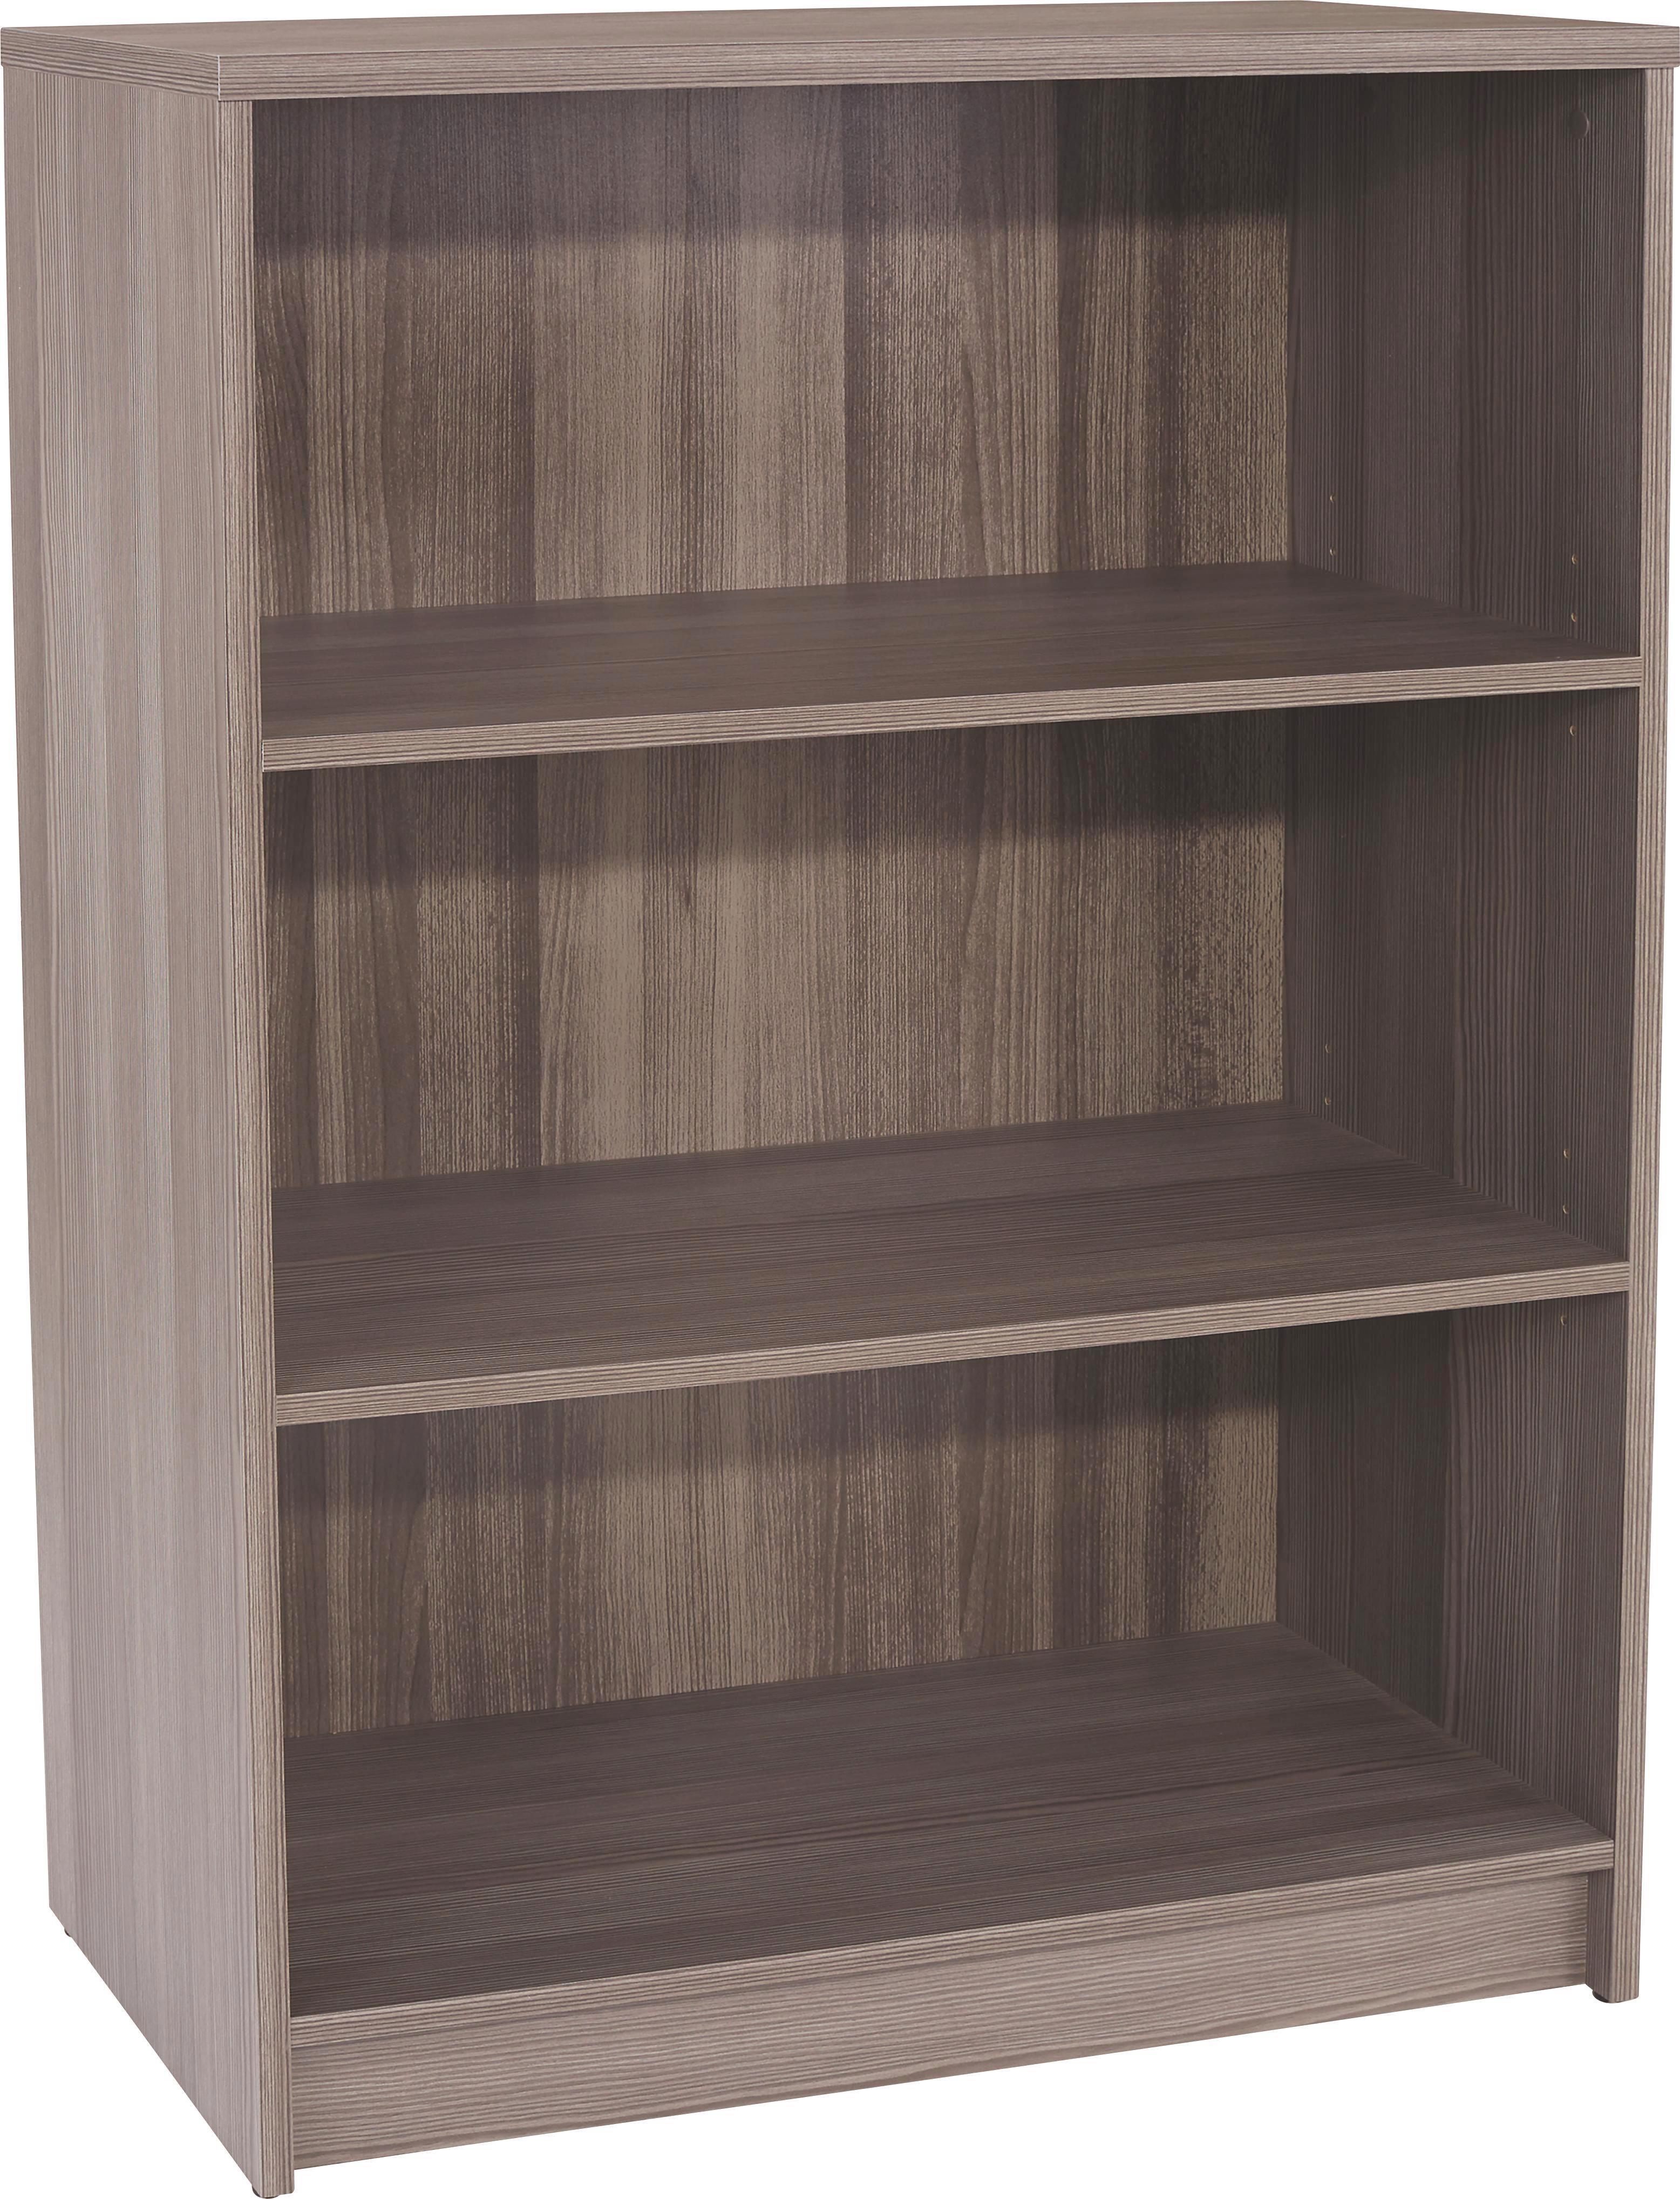 Regal 4-you Yur02 - temno rjava, leseni material (74/111,4/34,6cm)